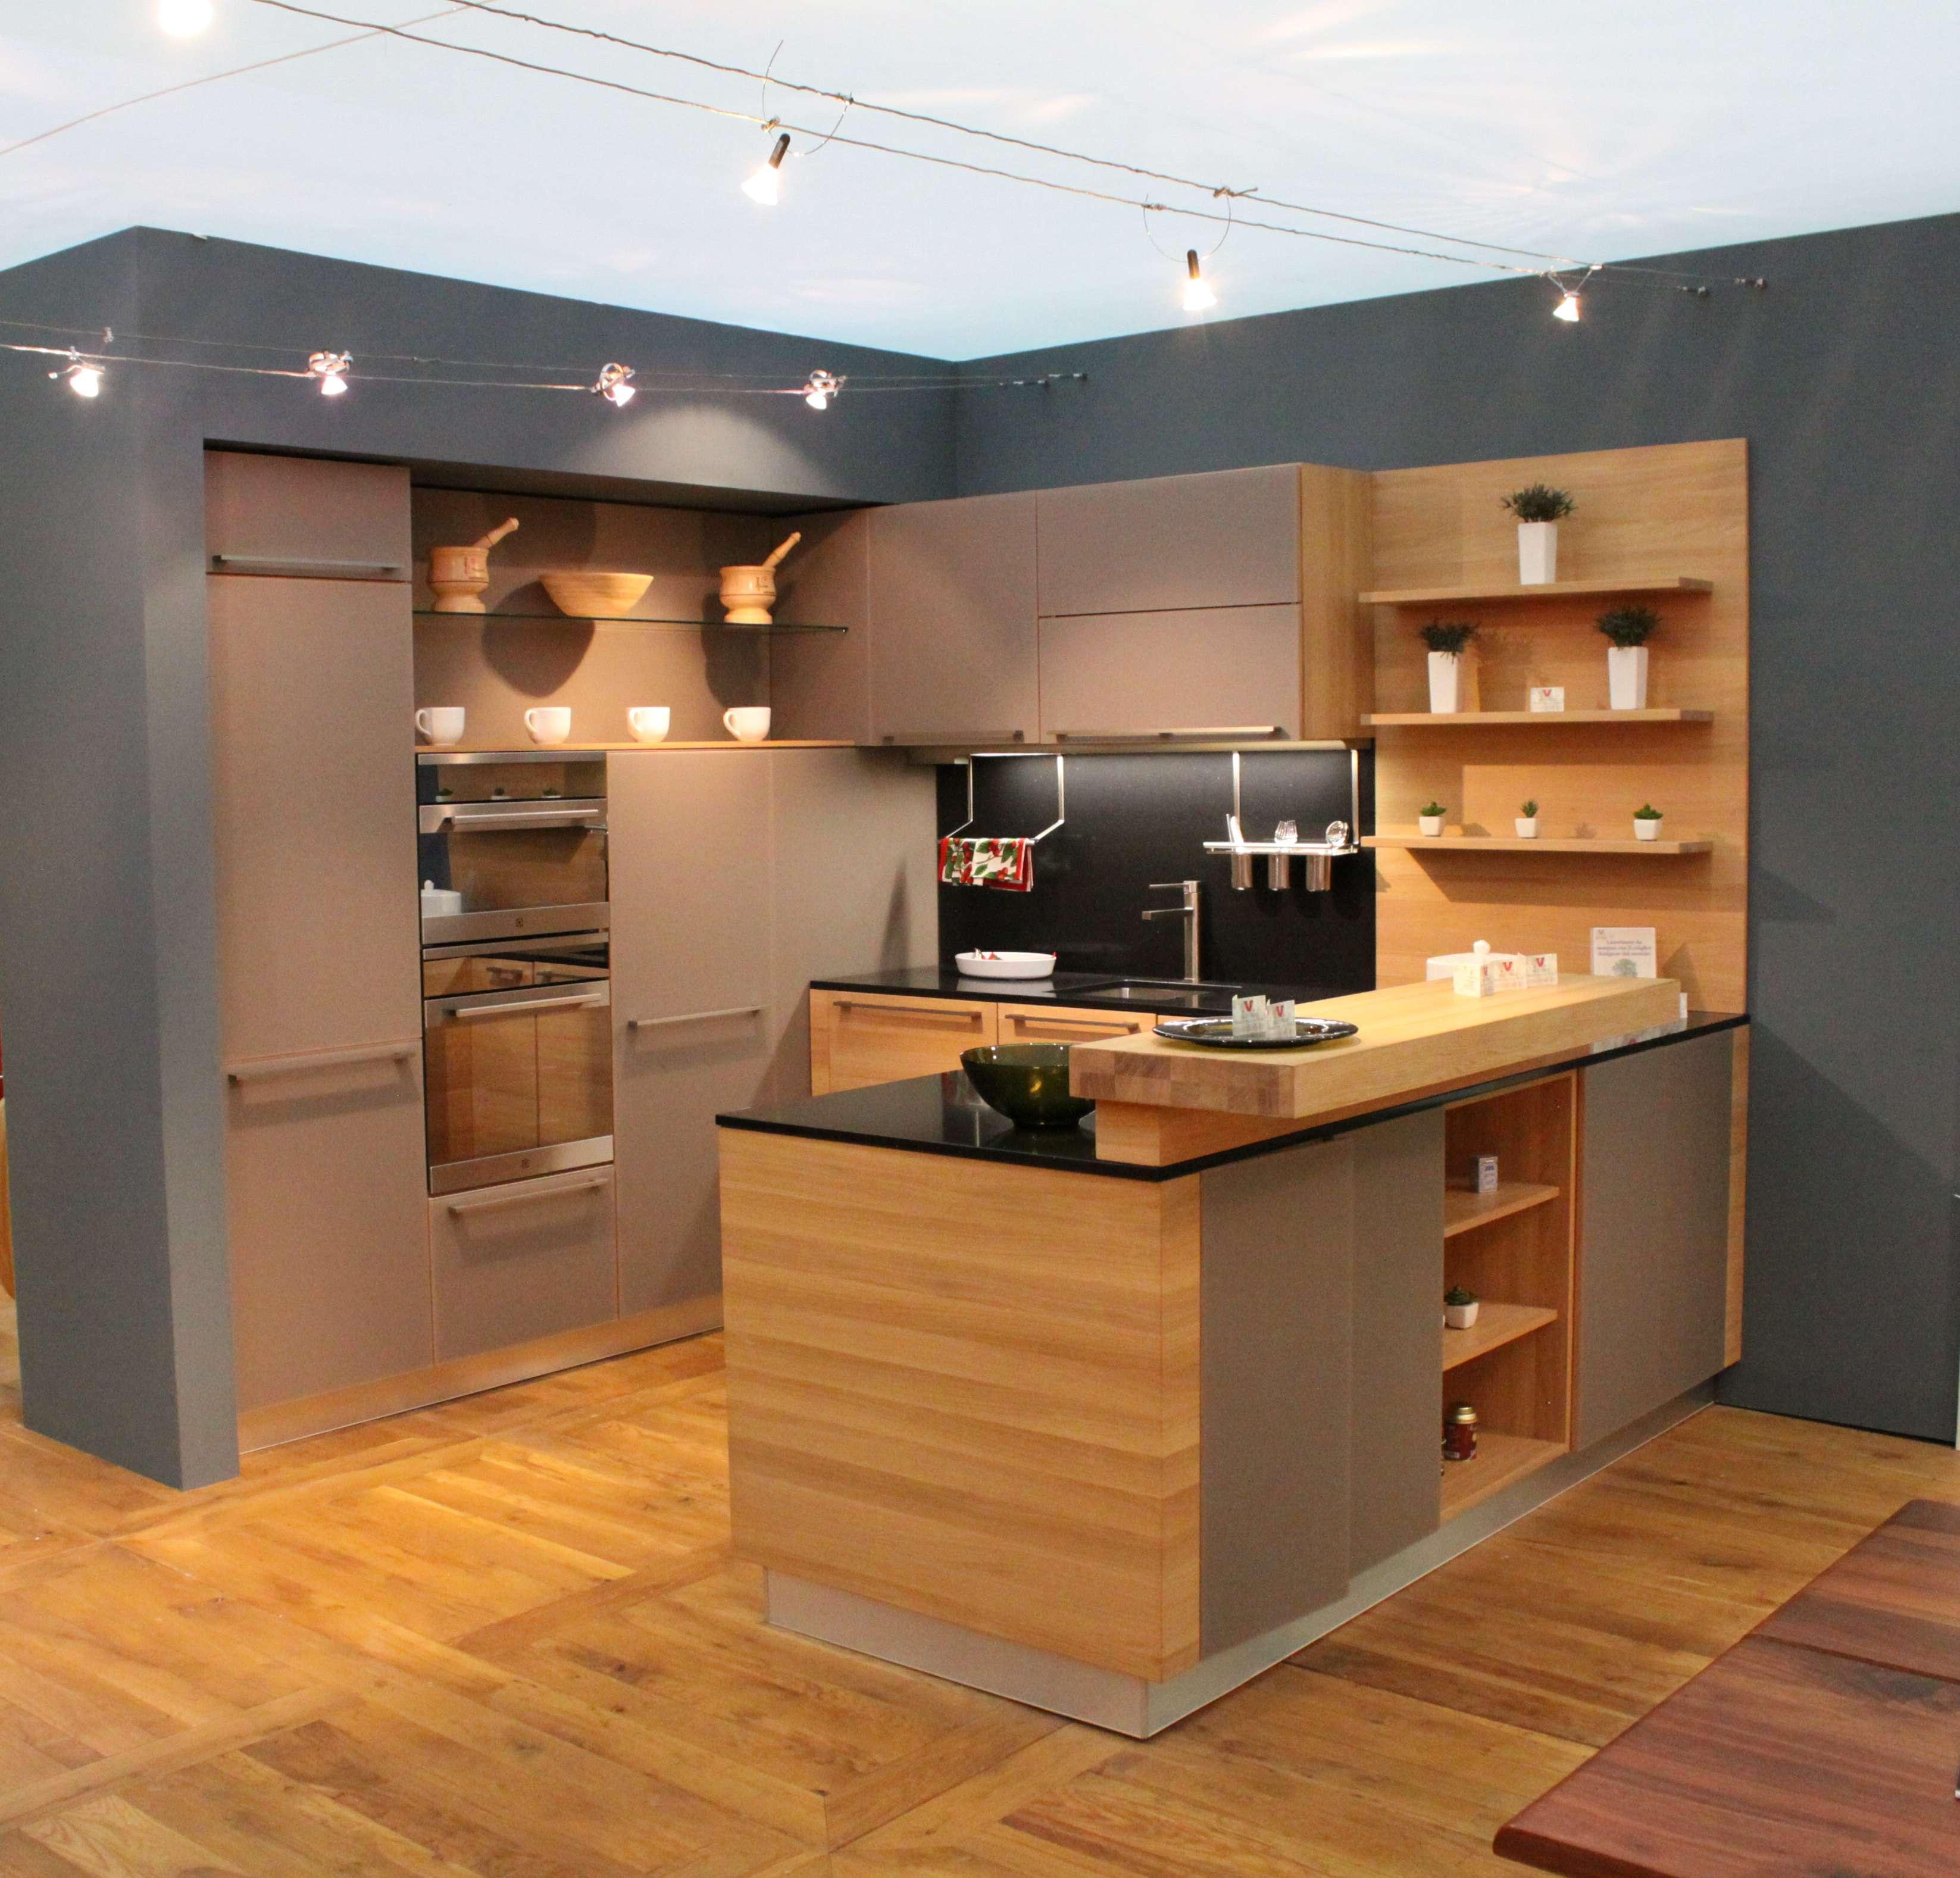 Emejing mobili cucina genova ideas for Arredo bagno genova